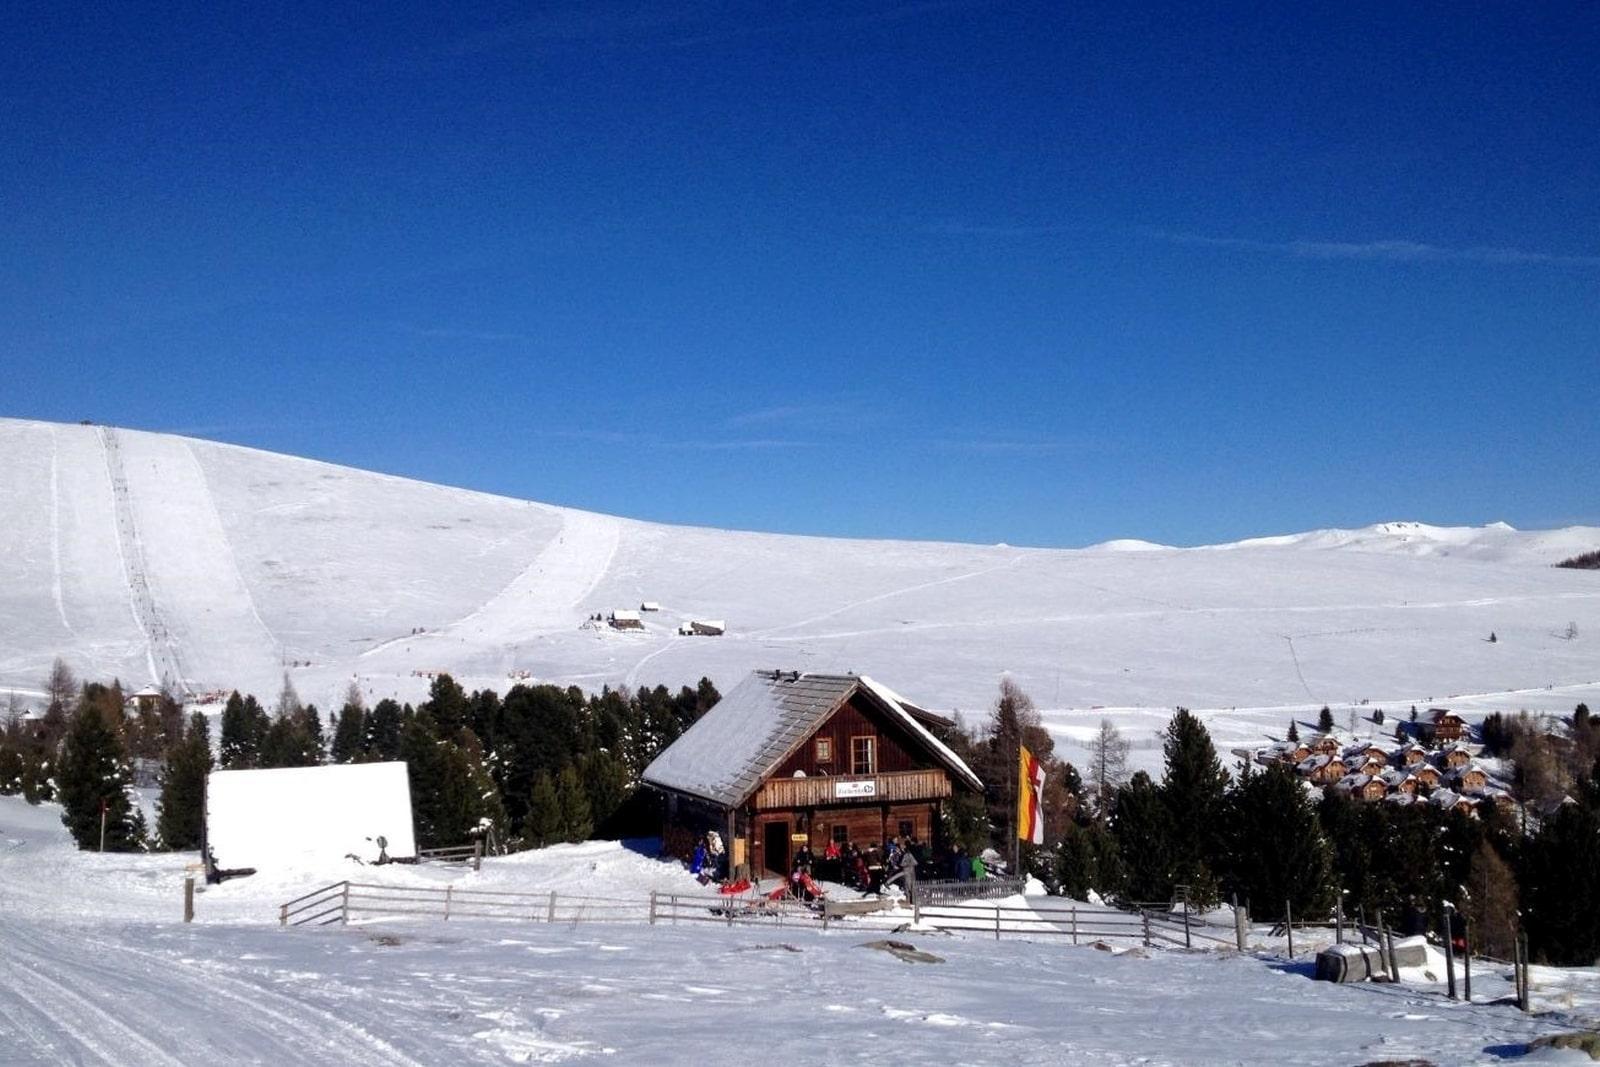 Heidi-Chalet-Falkert-Heidialm-Restaurant-Zirbenhuette-Winter